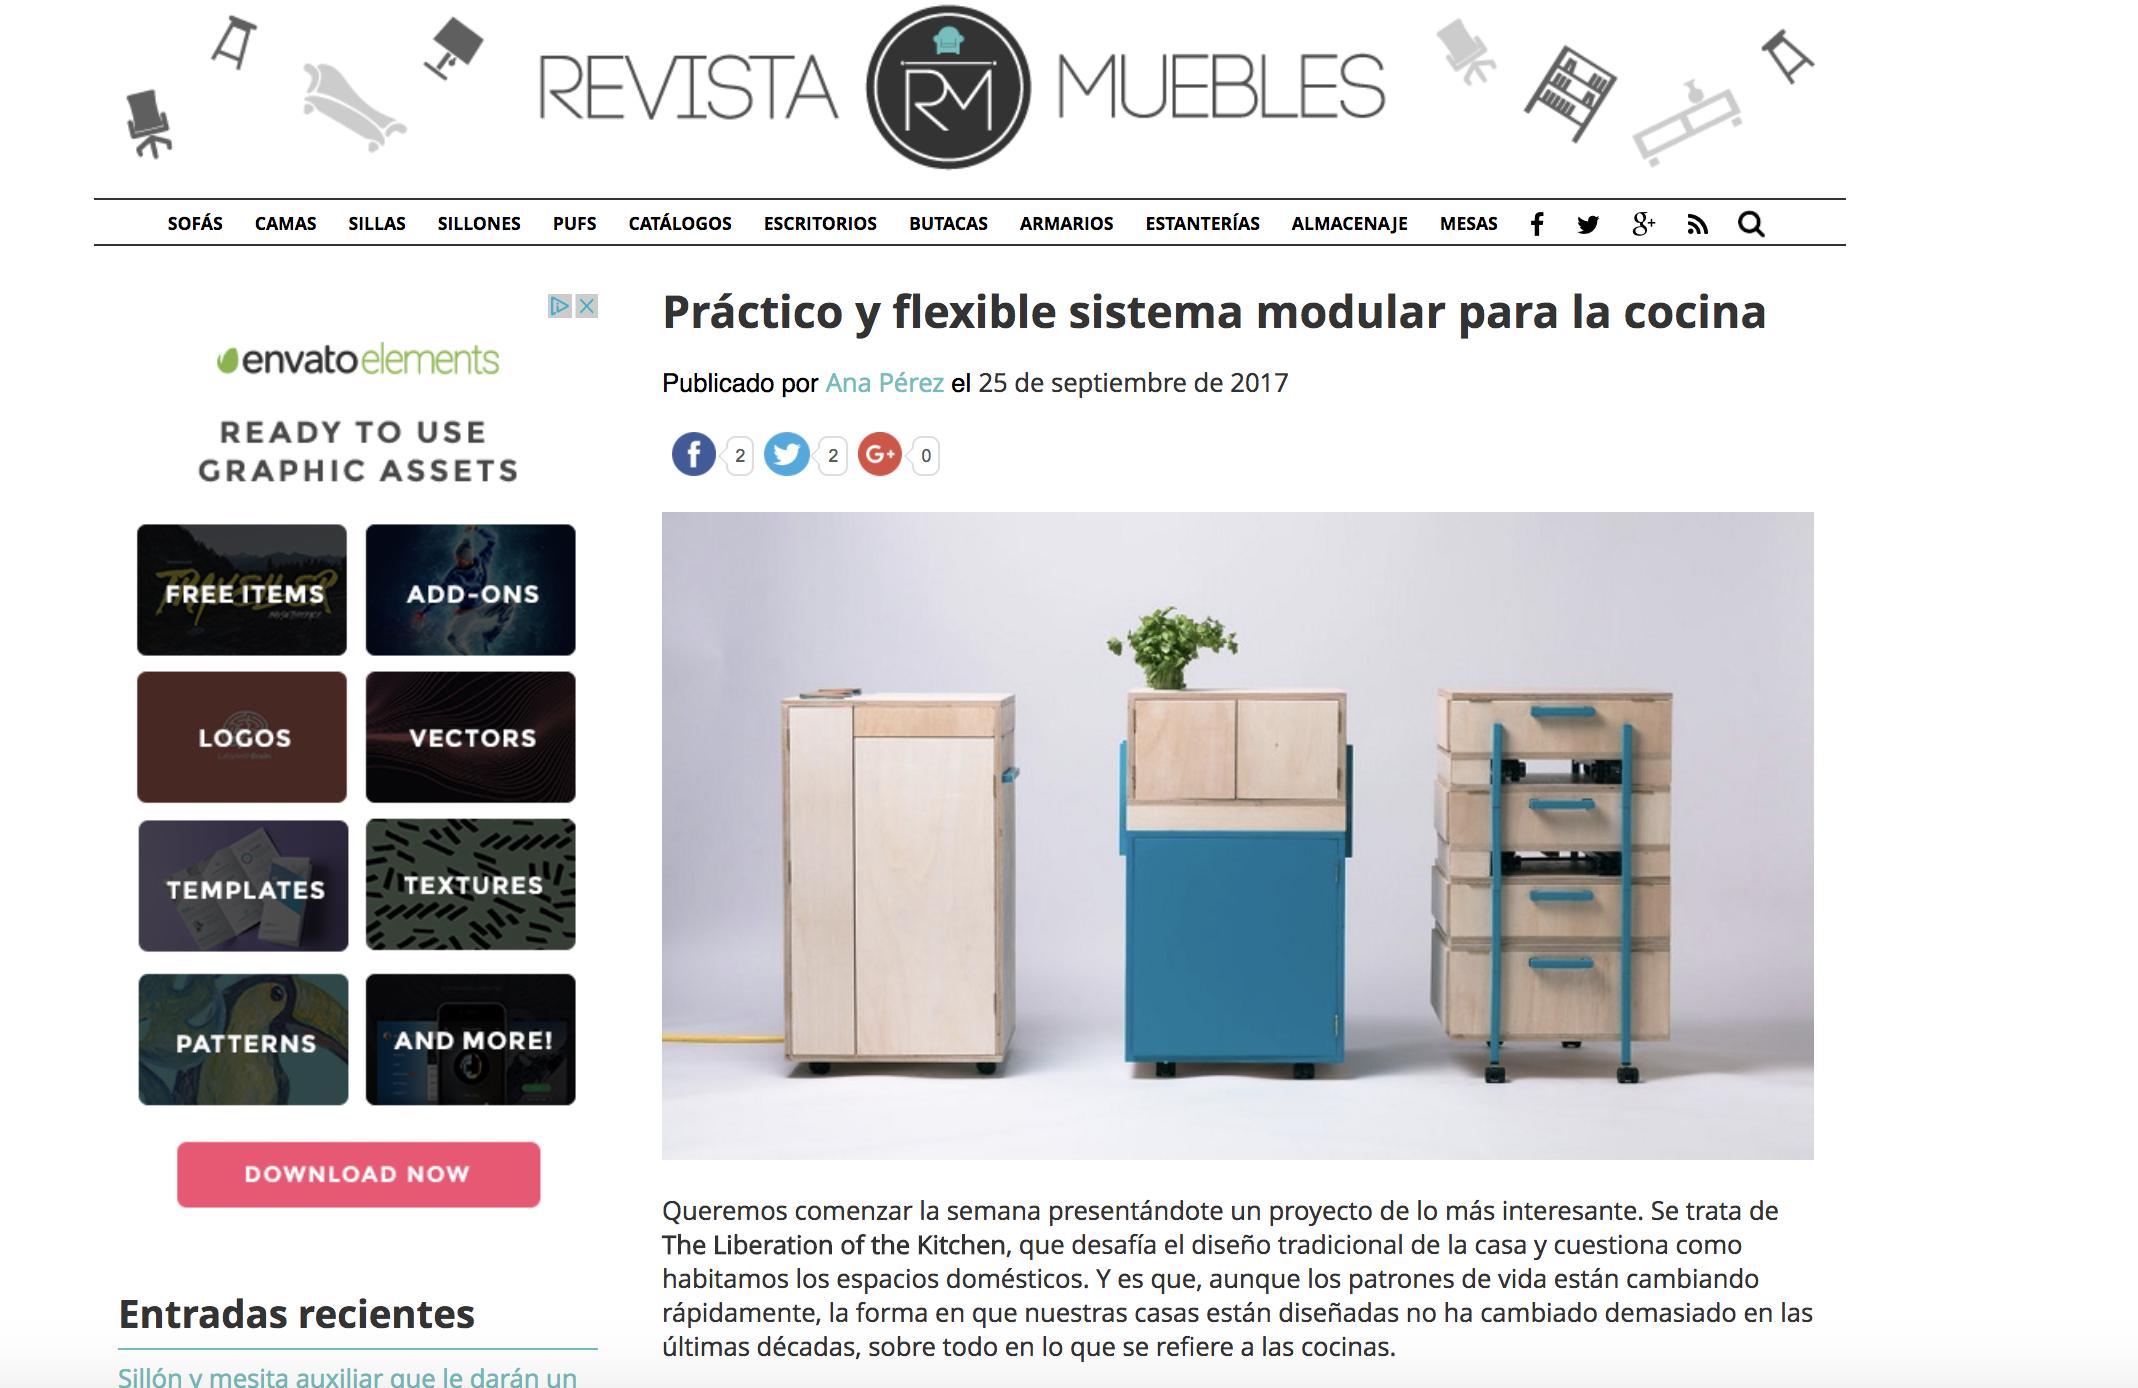 Revista Muebles -  Barcelona, 2017